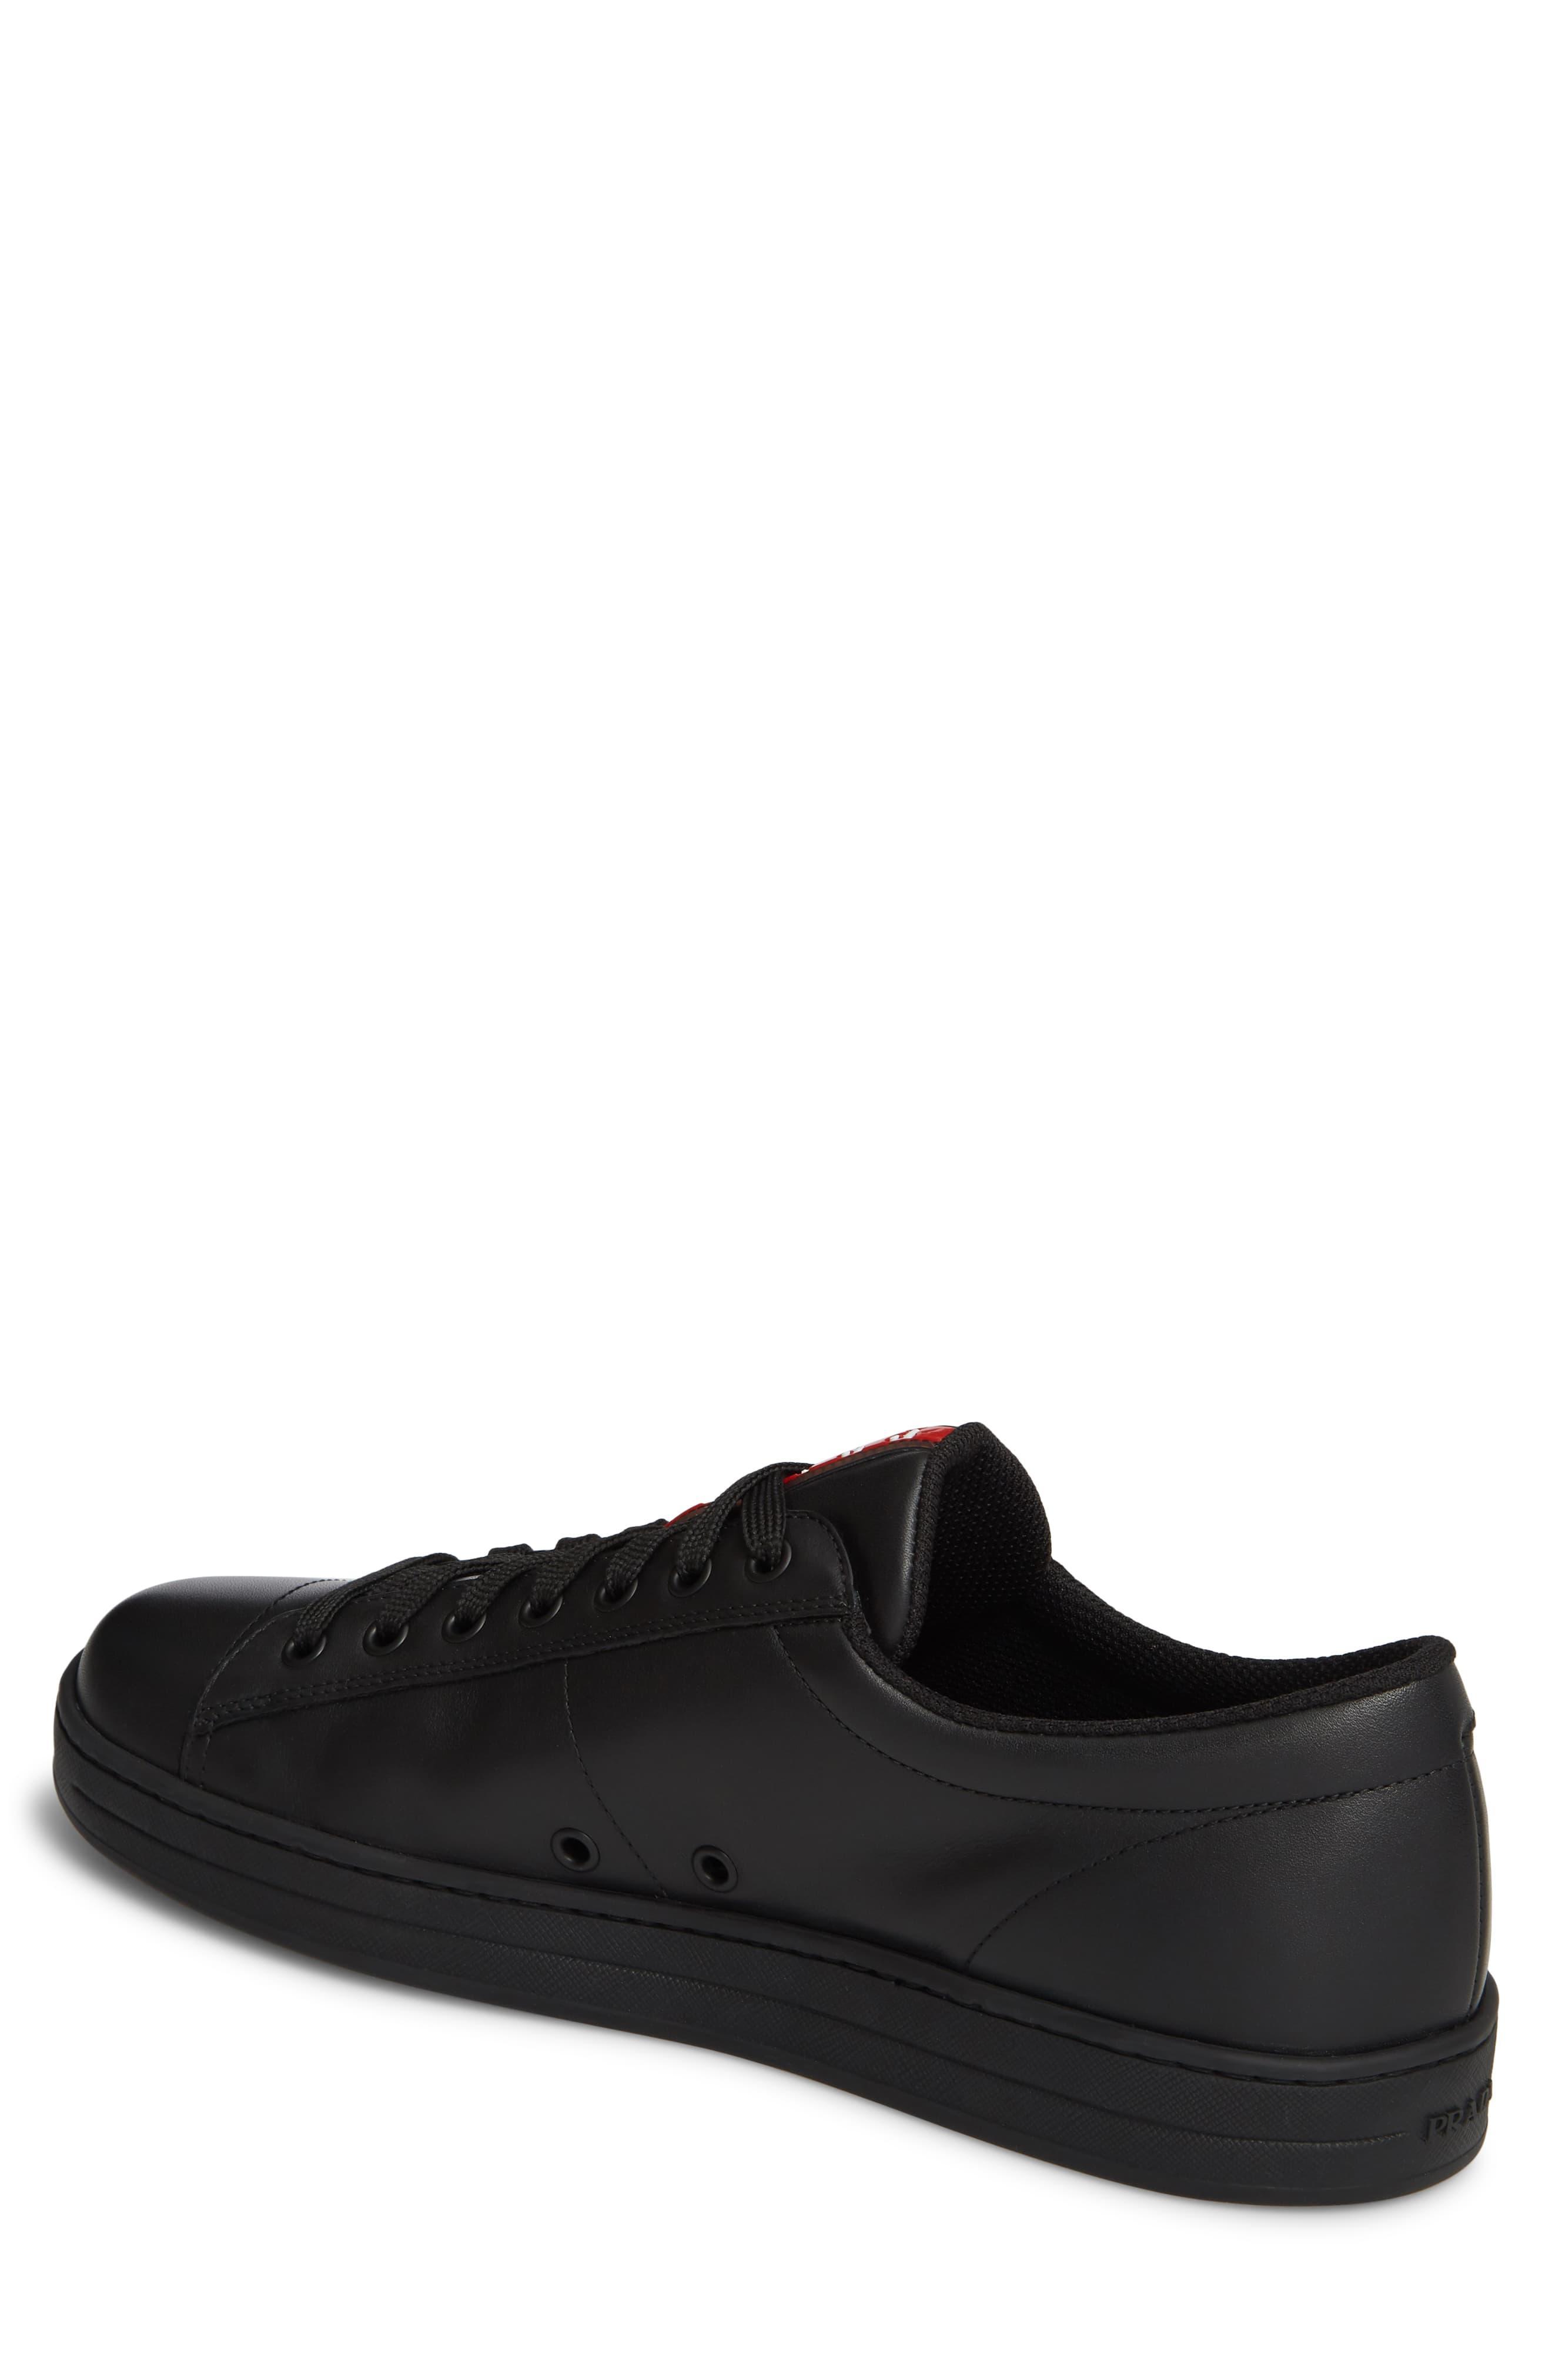 Prada Leather The Avenue Sneaker in